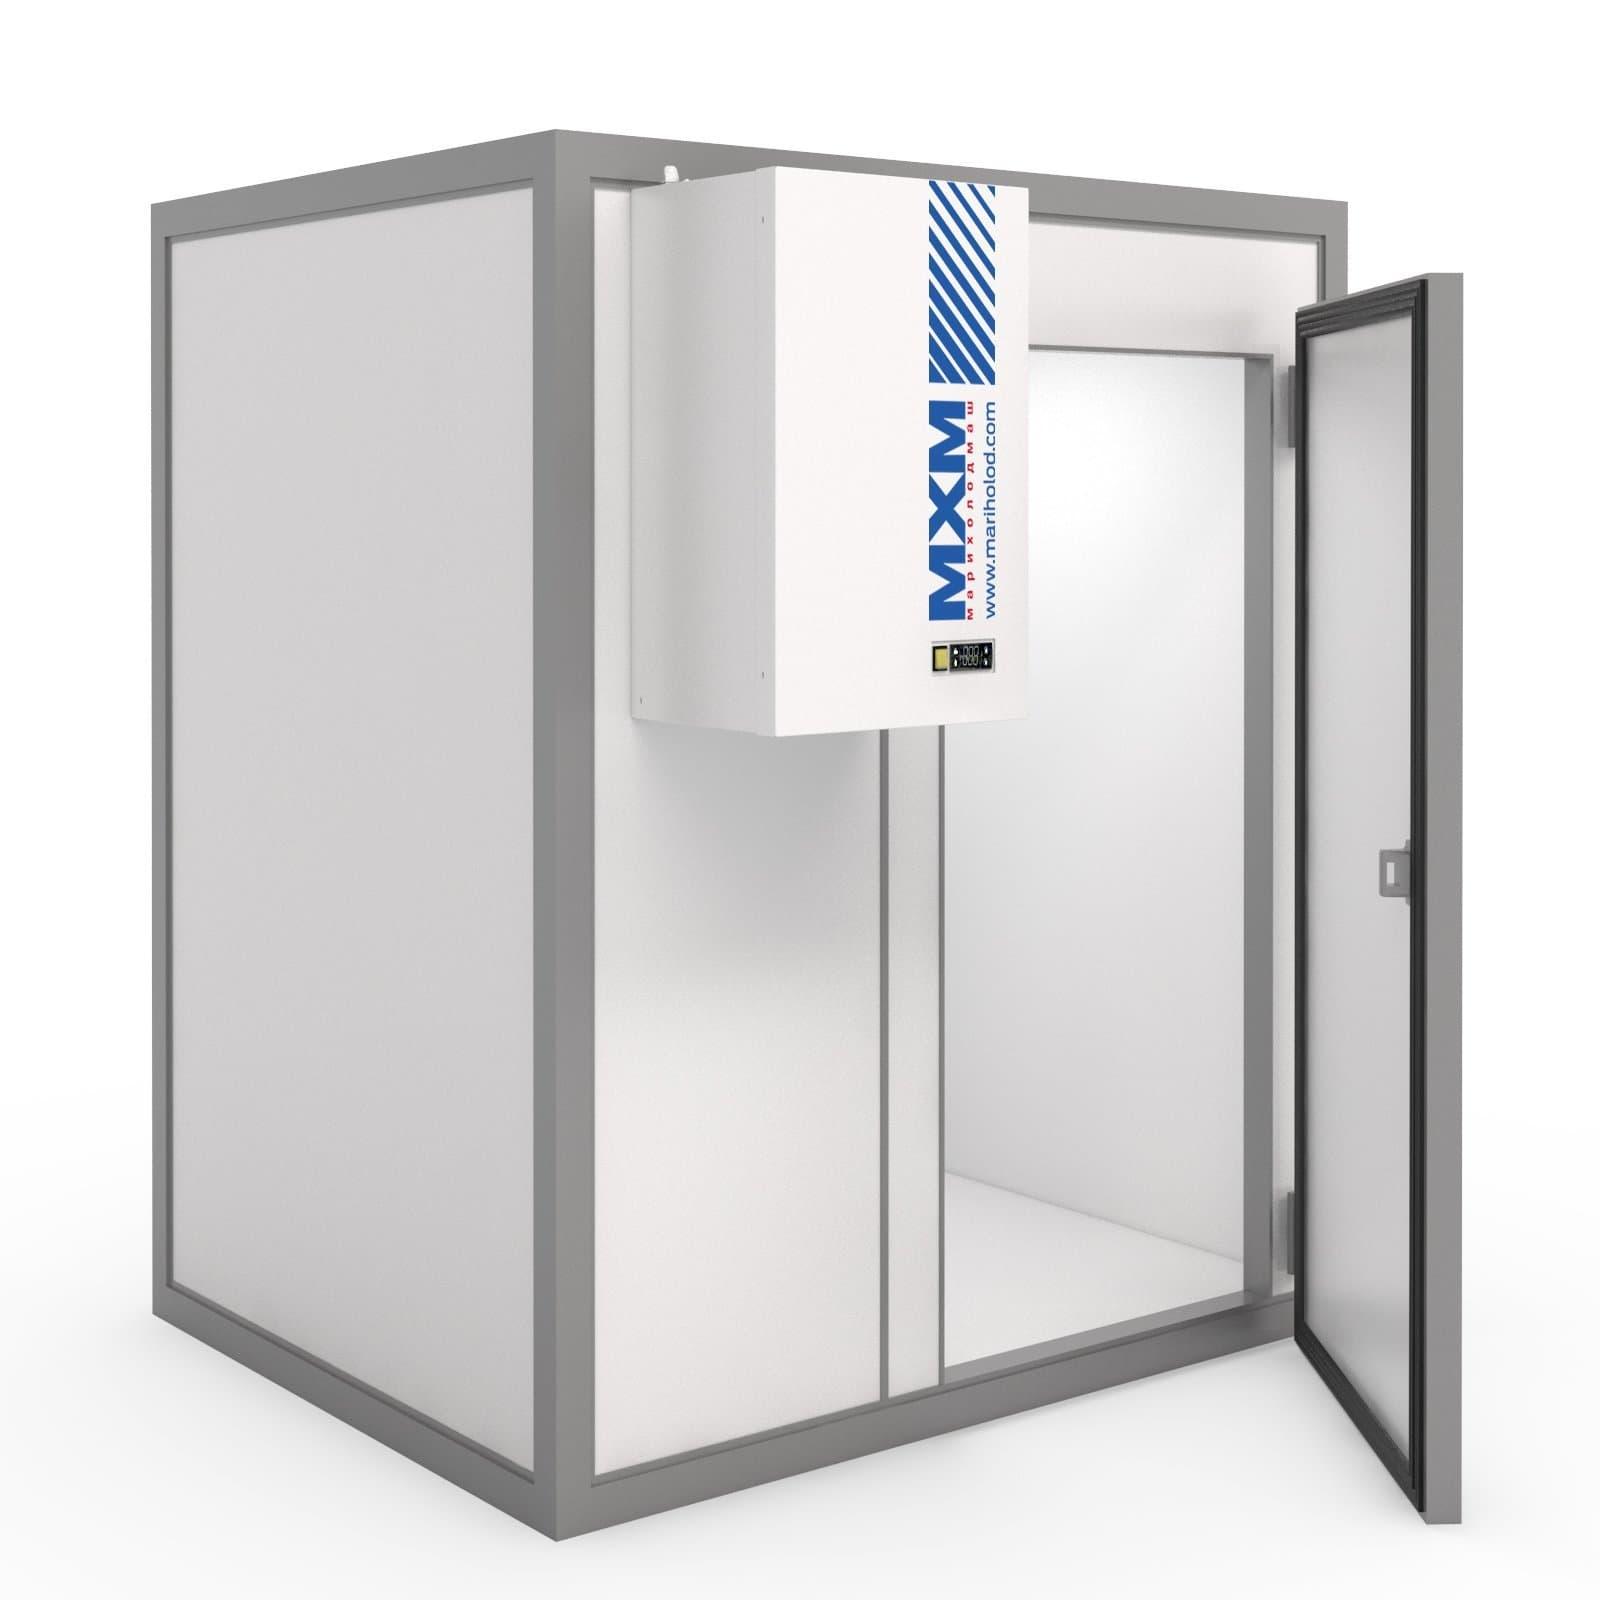 Камера холодильная КХН-53,45 (2560×8860×2720 мм)